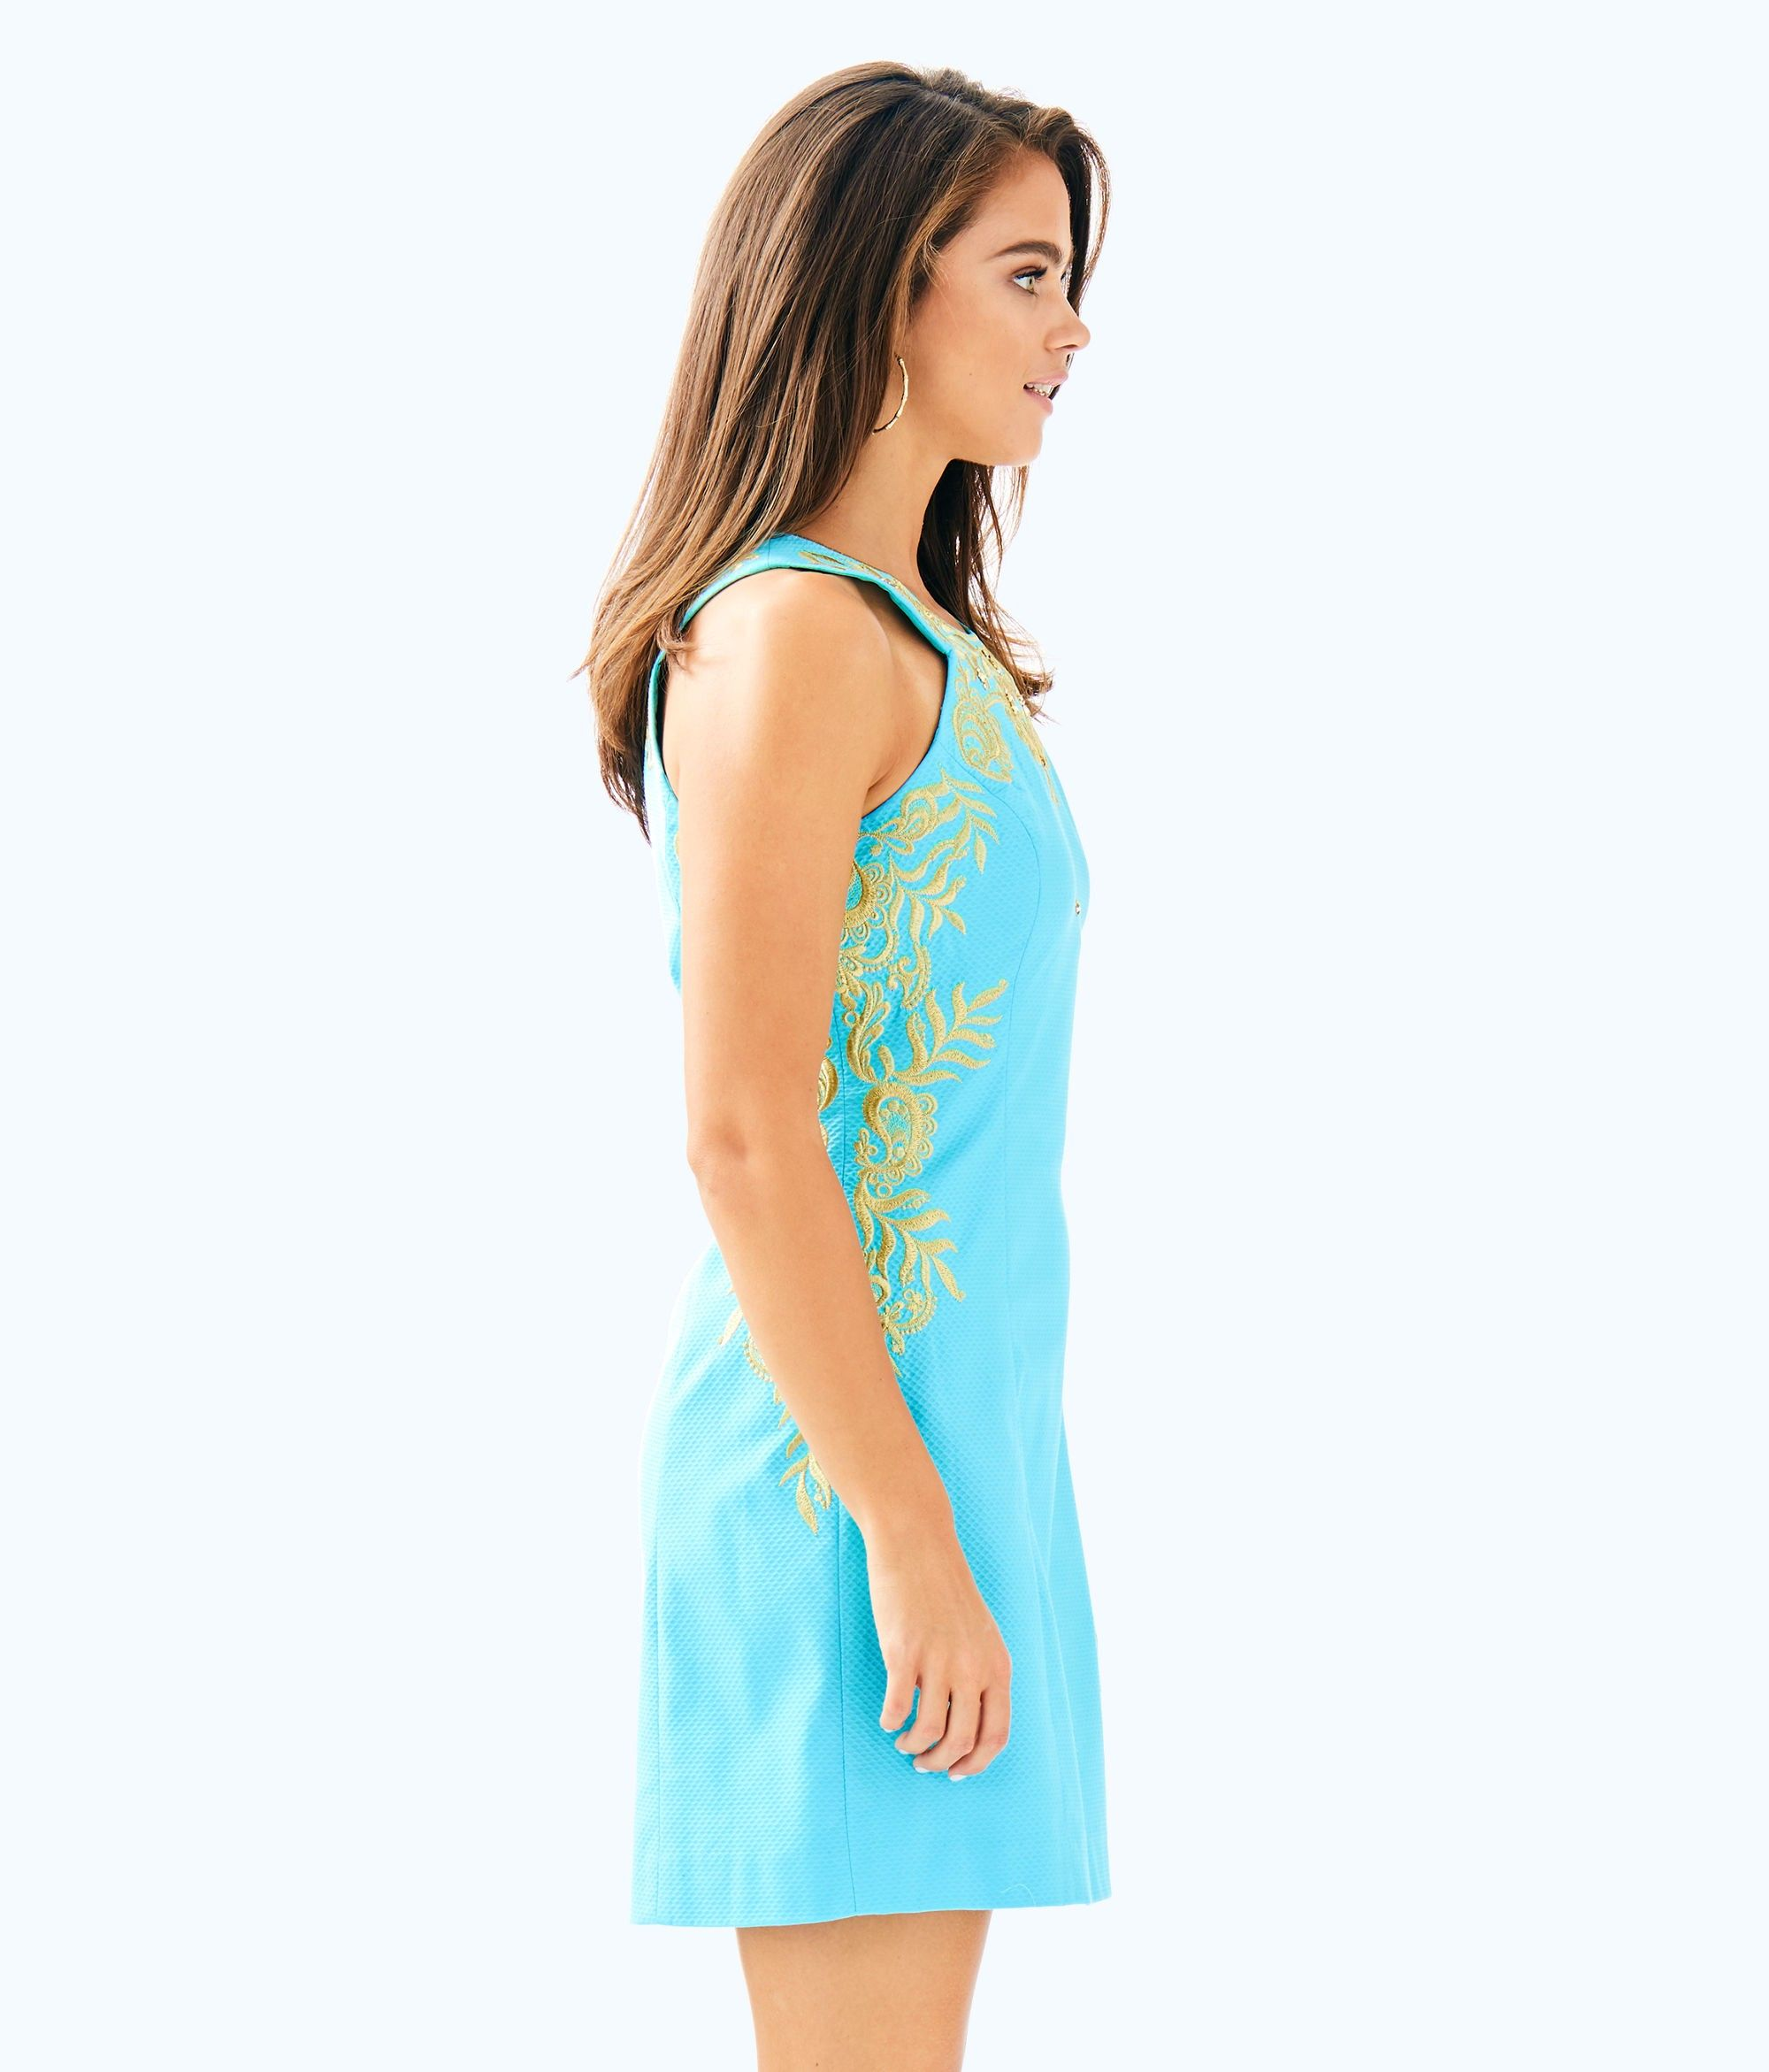 fa87117468c9 Lilly Pulitzer Tina Stretch Shift Dress - 0 Gold